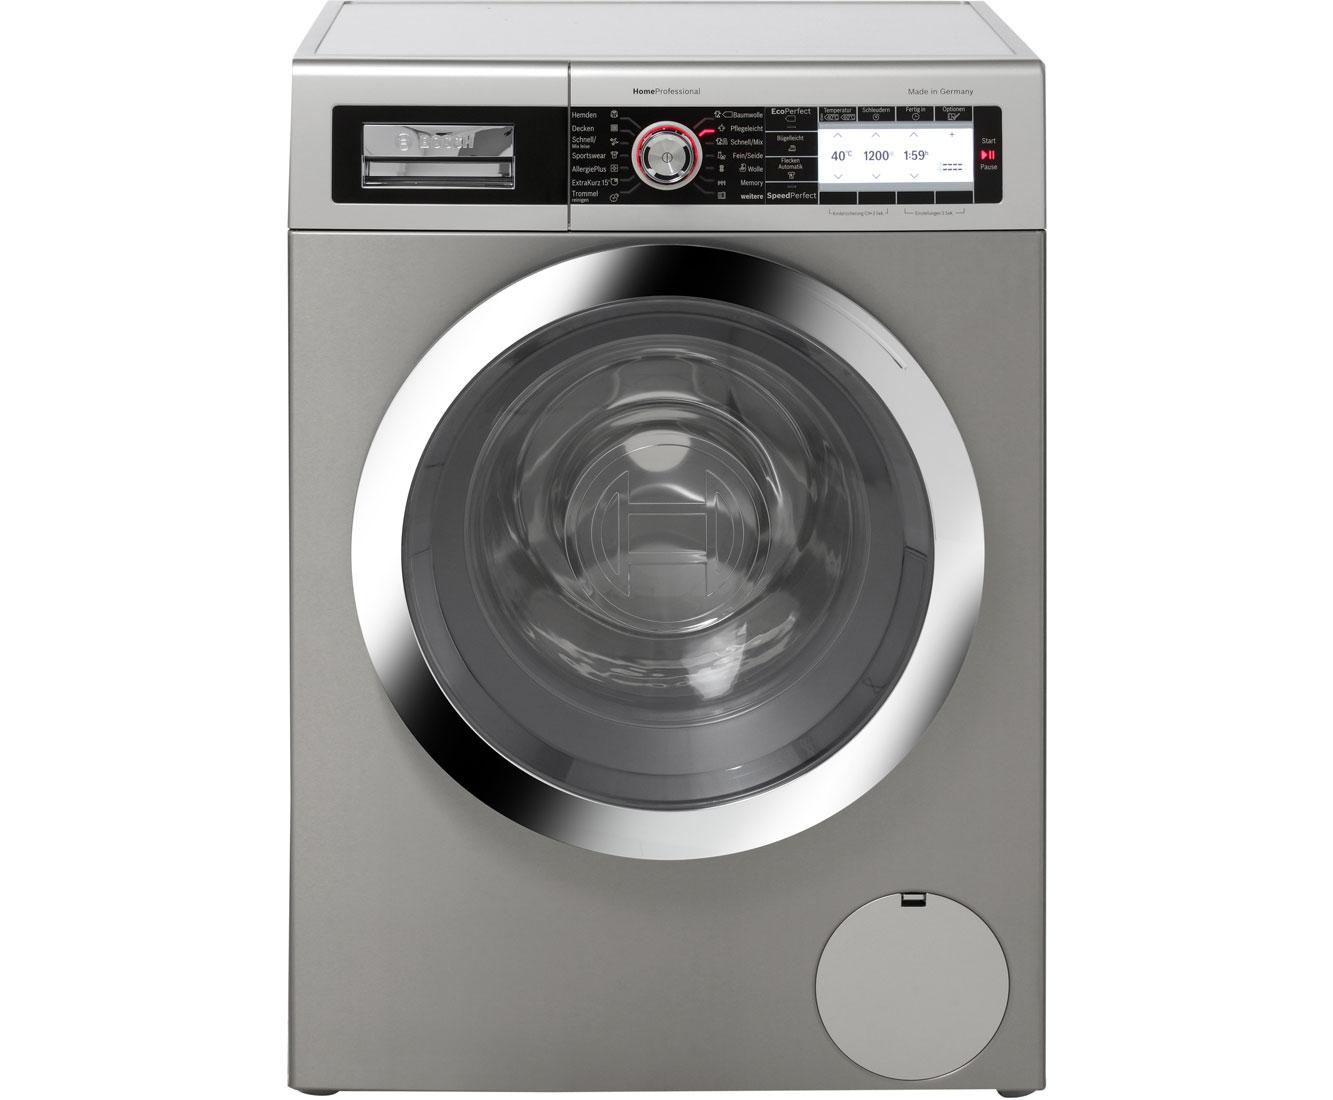 Bosch Way327x0 Waschmaschine Edelstahl 9 Kg 1600 U Min A